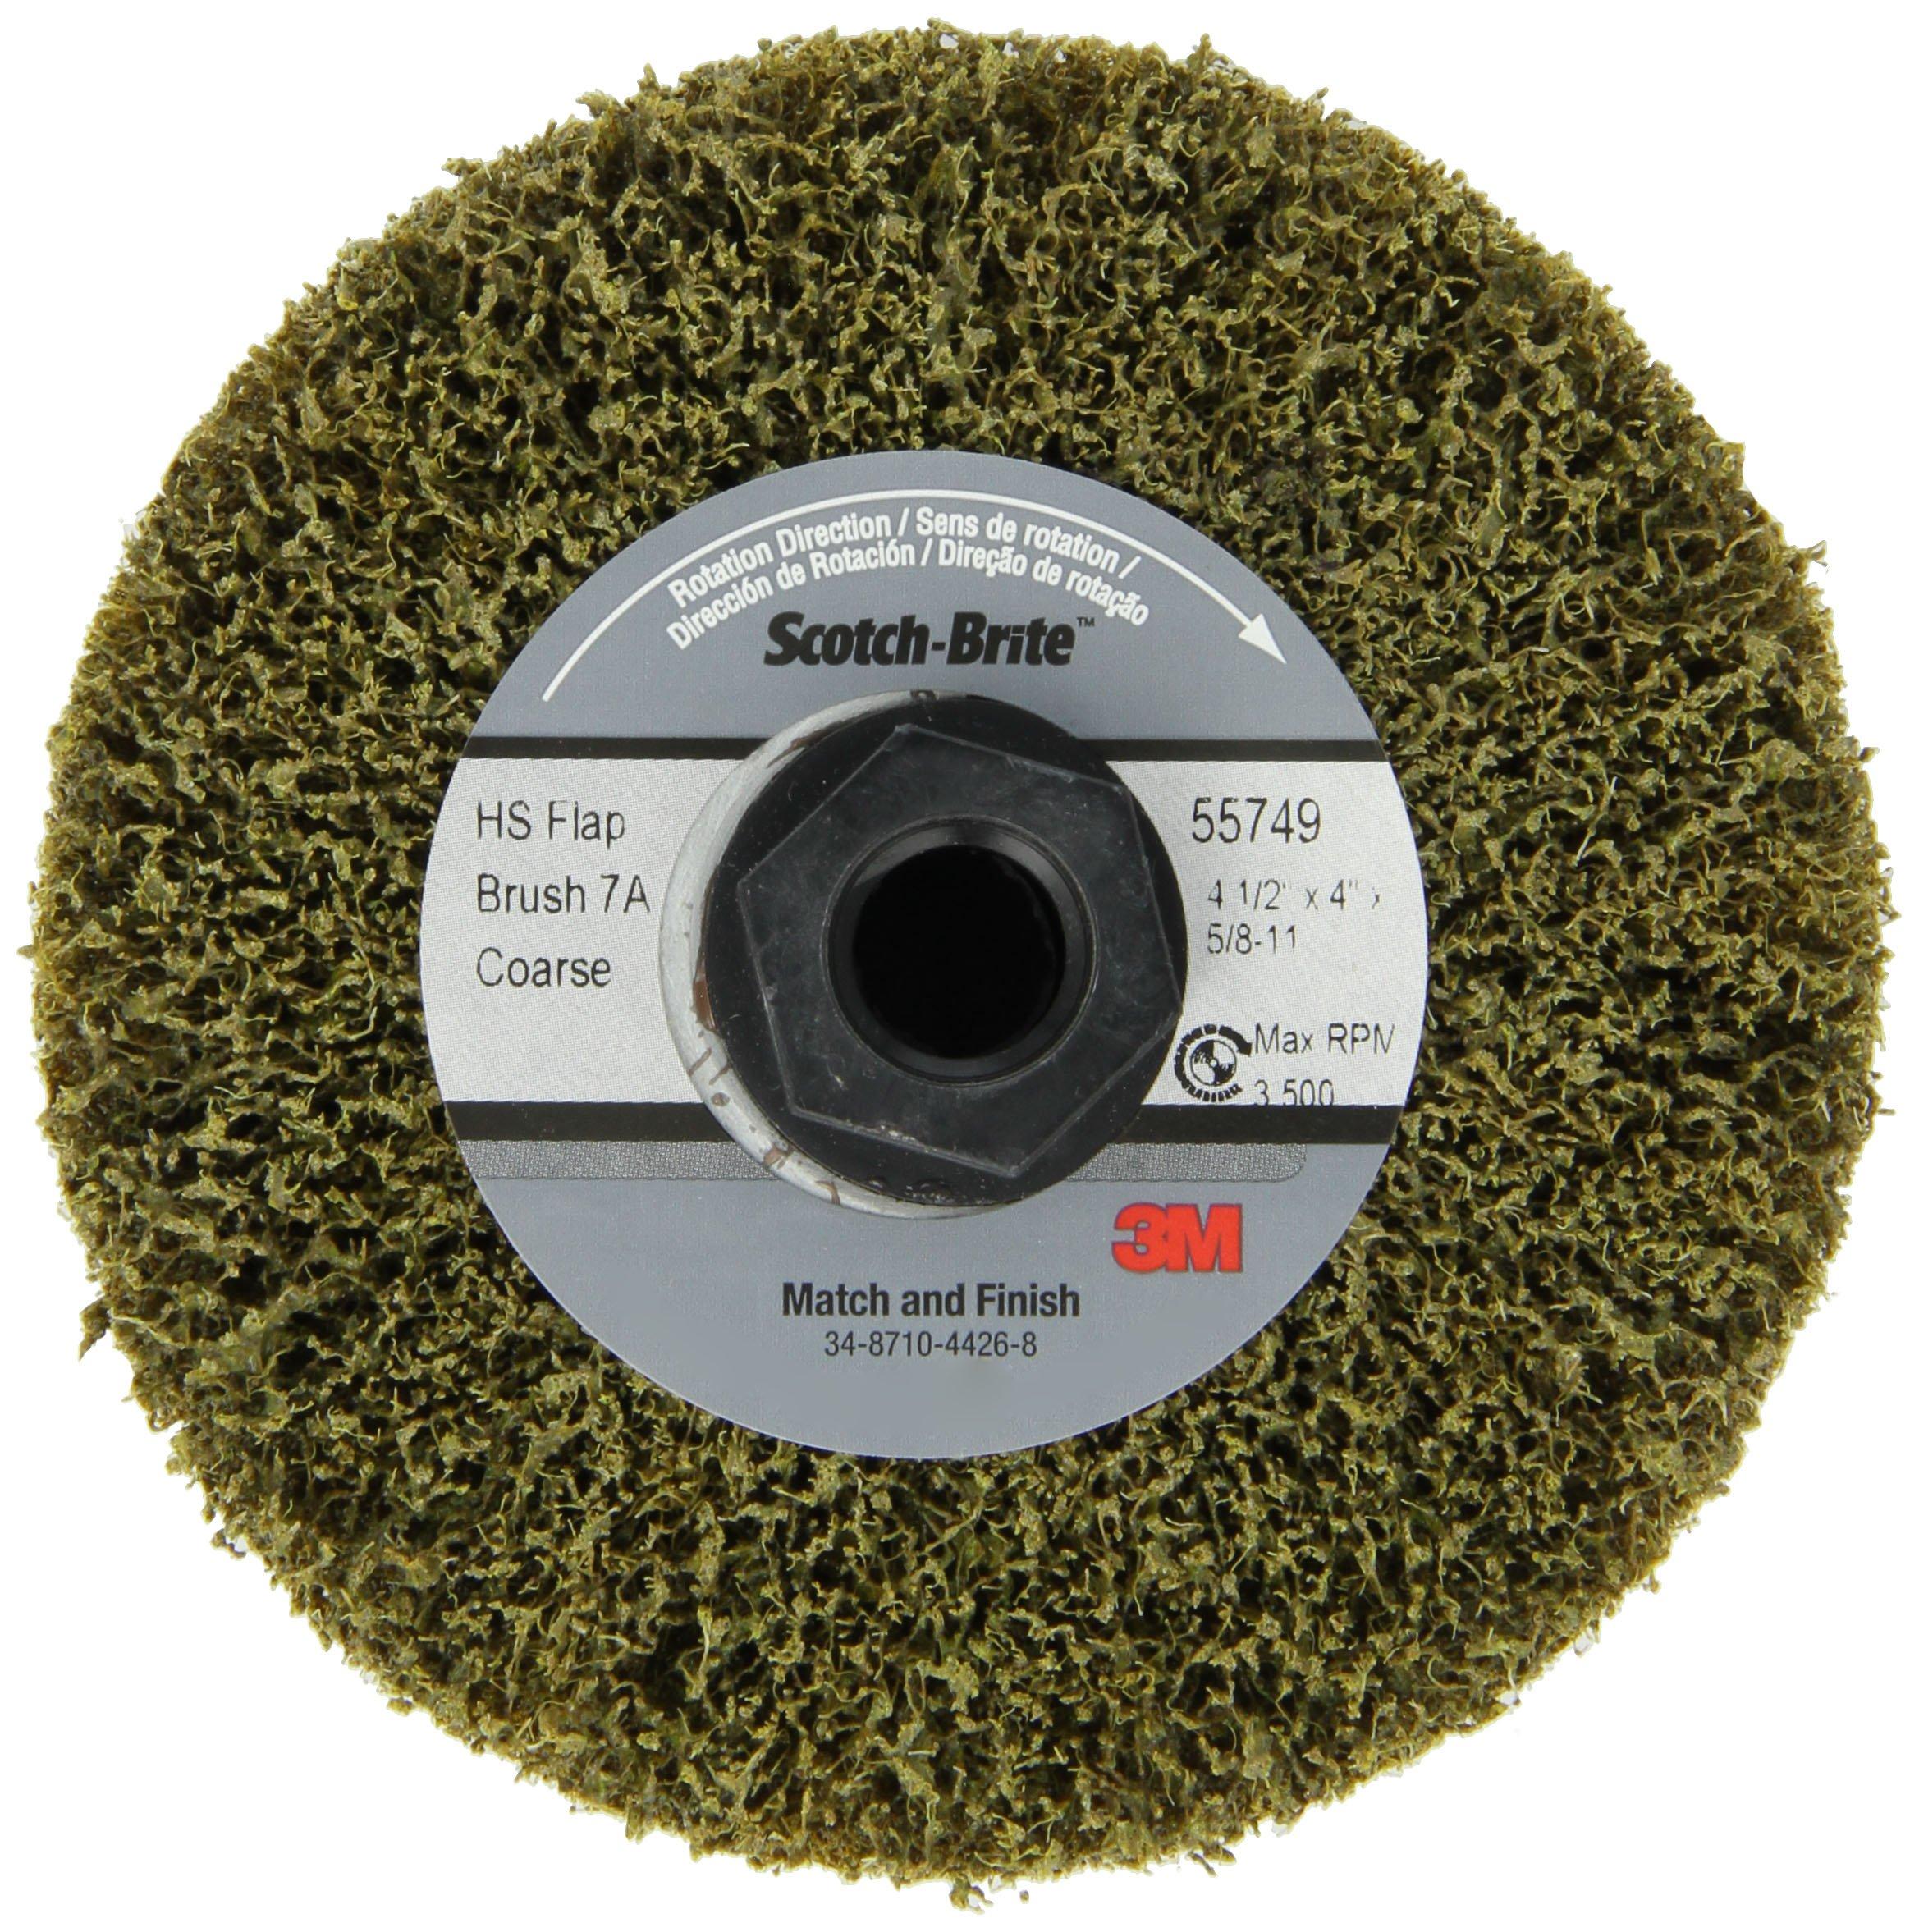 Scotch-Brite(TM) Match and Finish High Strength Flap Brush, Aluminum Oxide, 4-1/2'' Diameter x 4'' Width, 5/8''-11 Thread, Coarse Grit (Pack of 1)